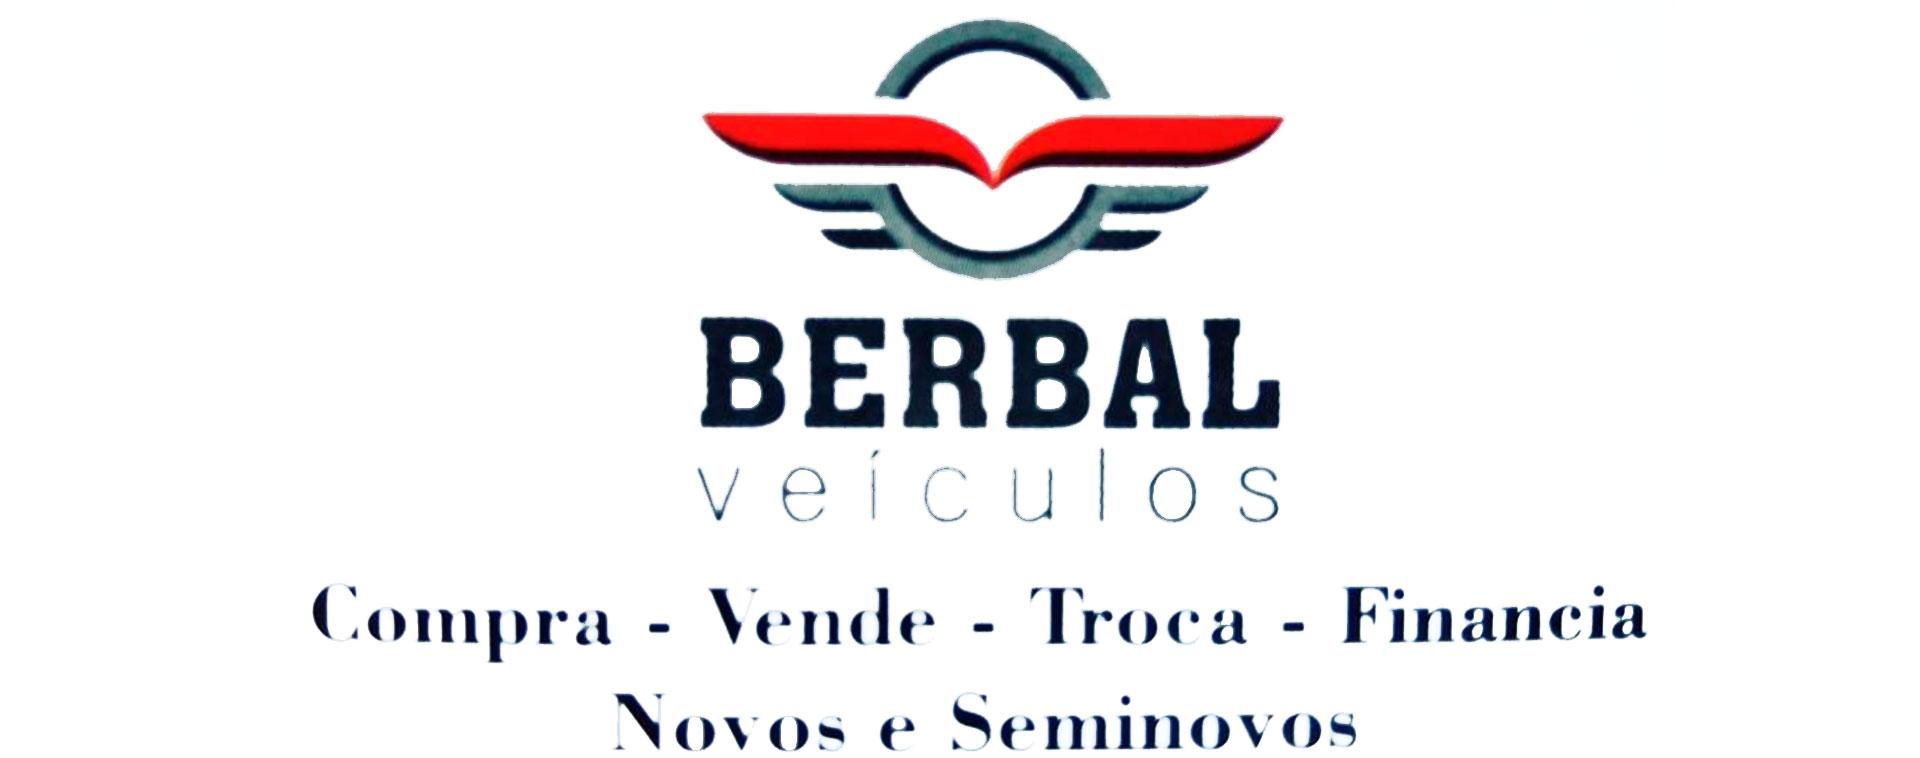 a4be8b13895 Empresa - Berbal Veículos